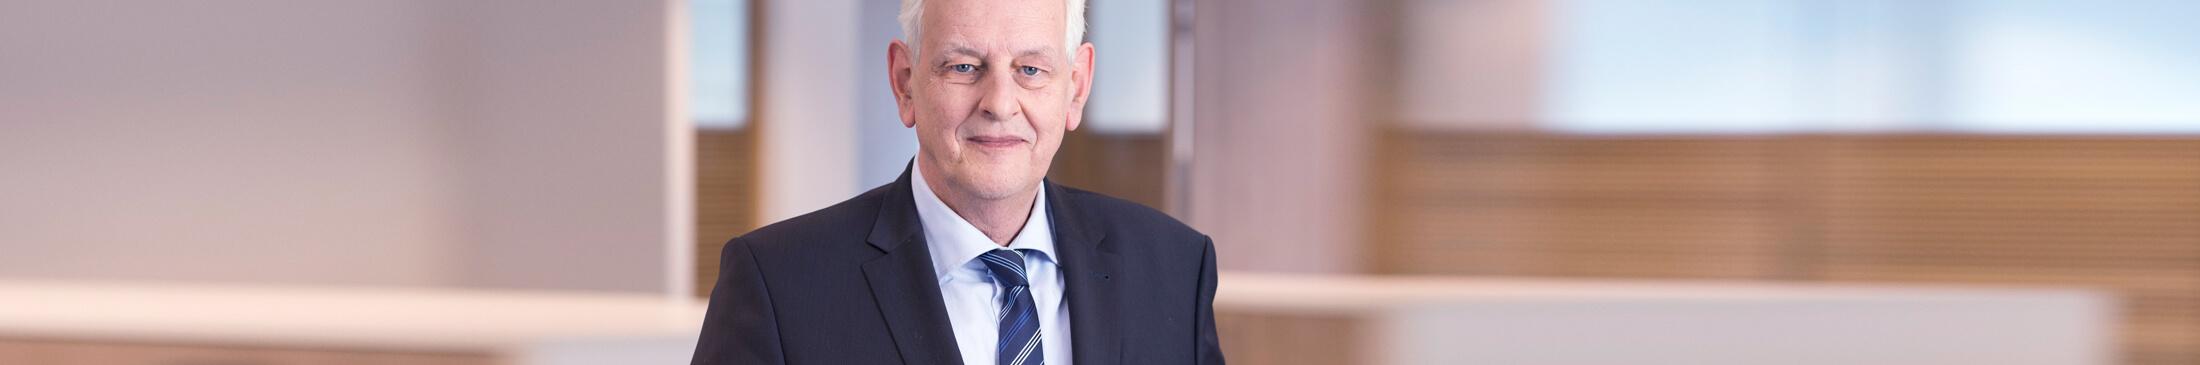 Rob Baetens letselschadeadvocaat MannaertsAppels Tilburg Breda